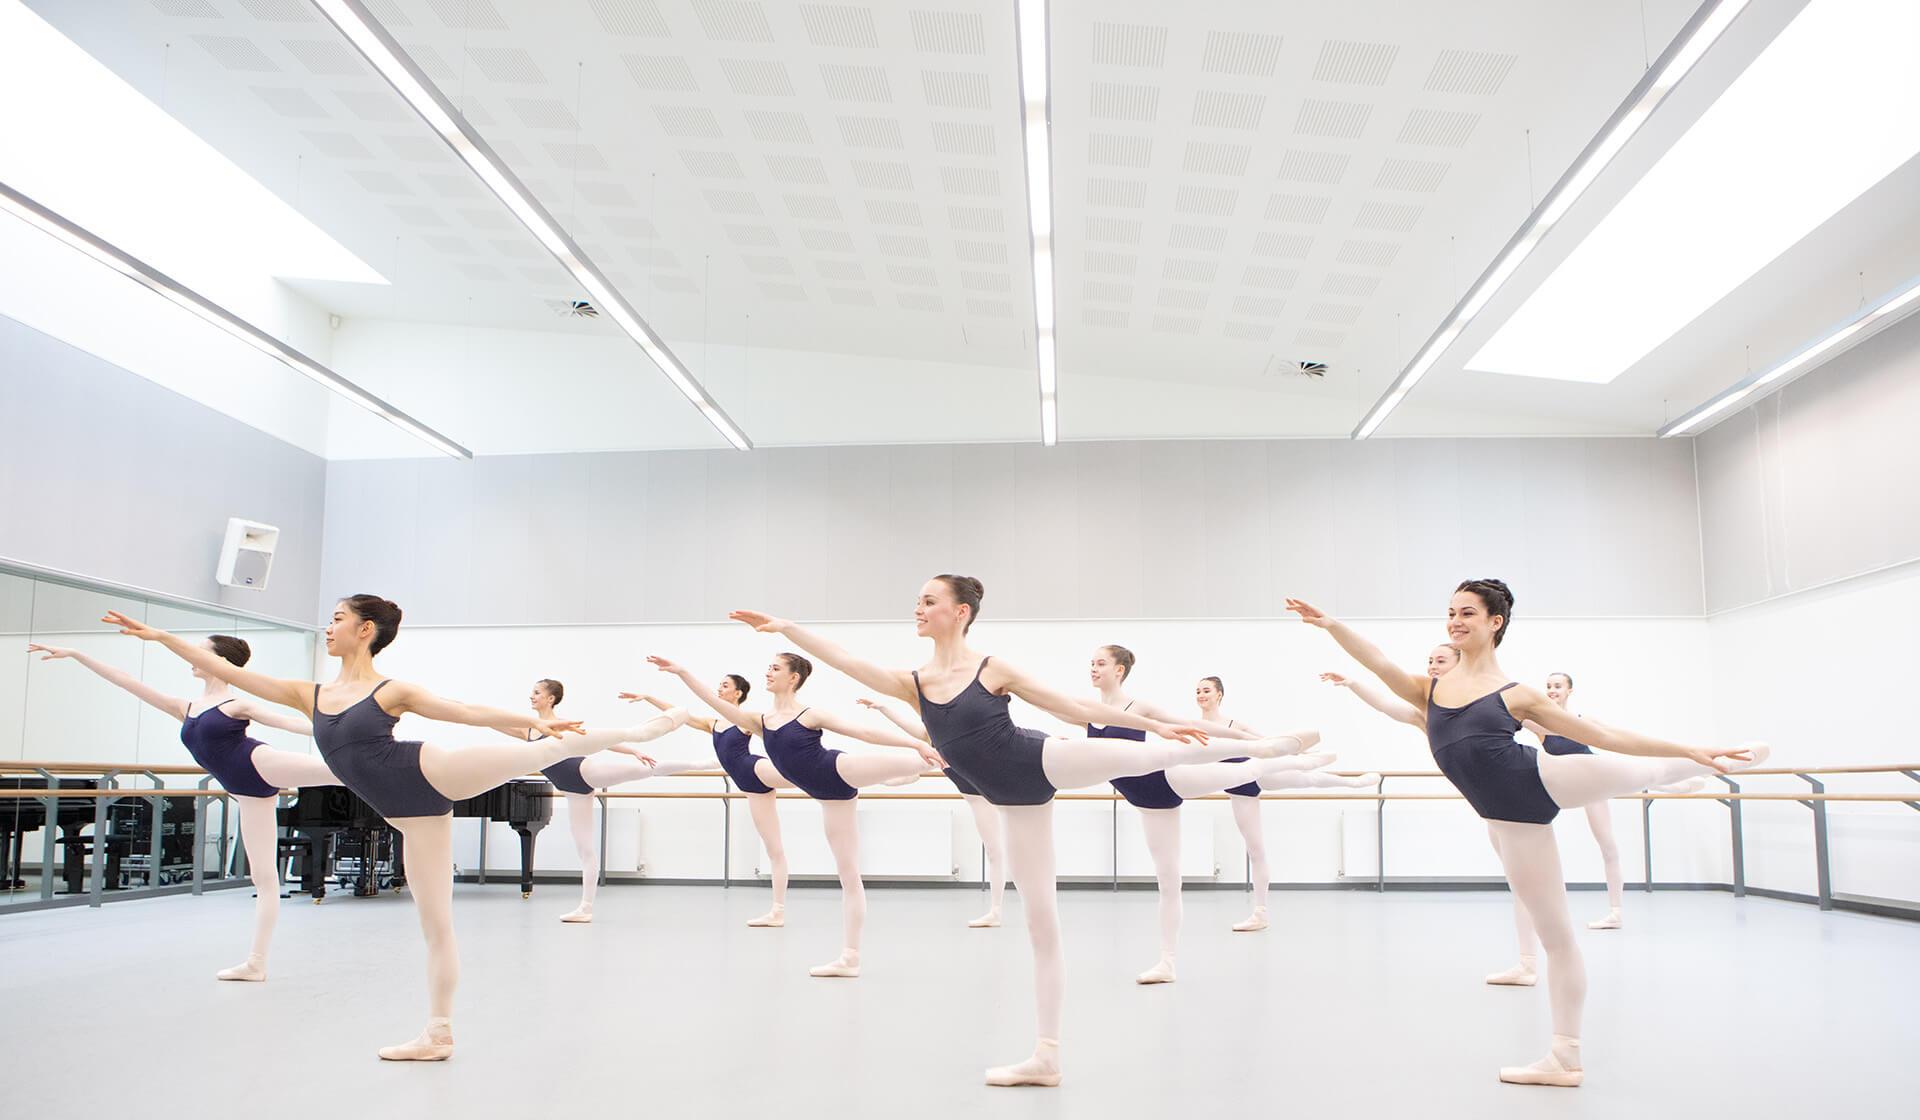 Ballet students practicing in a ballet studio